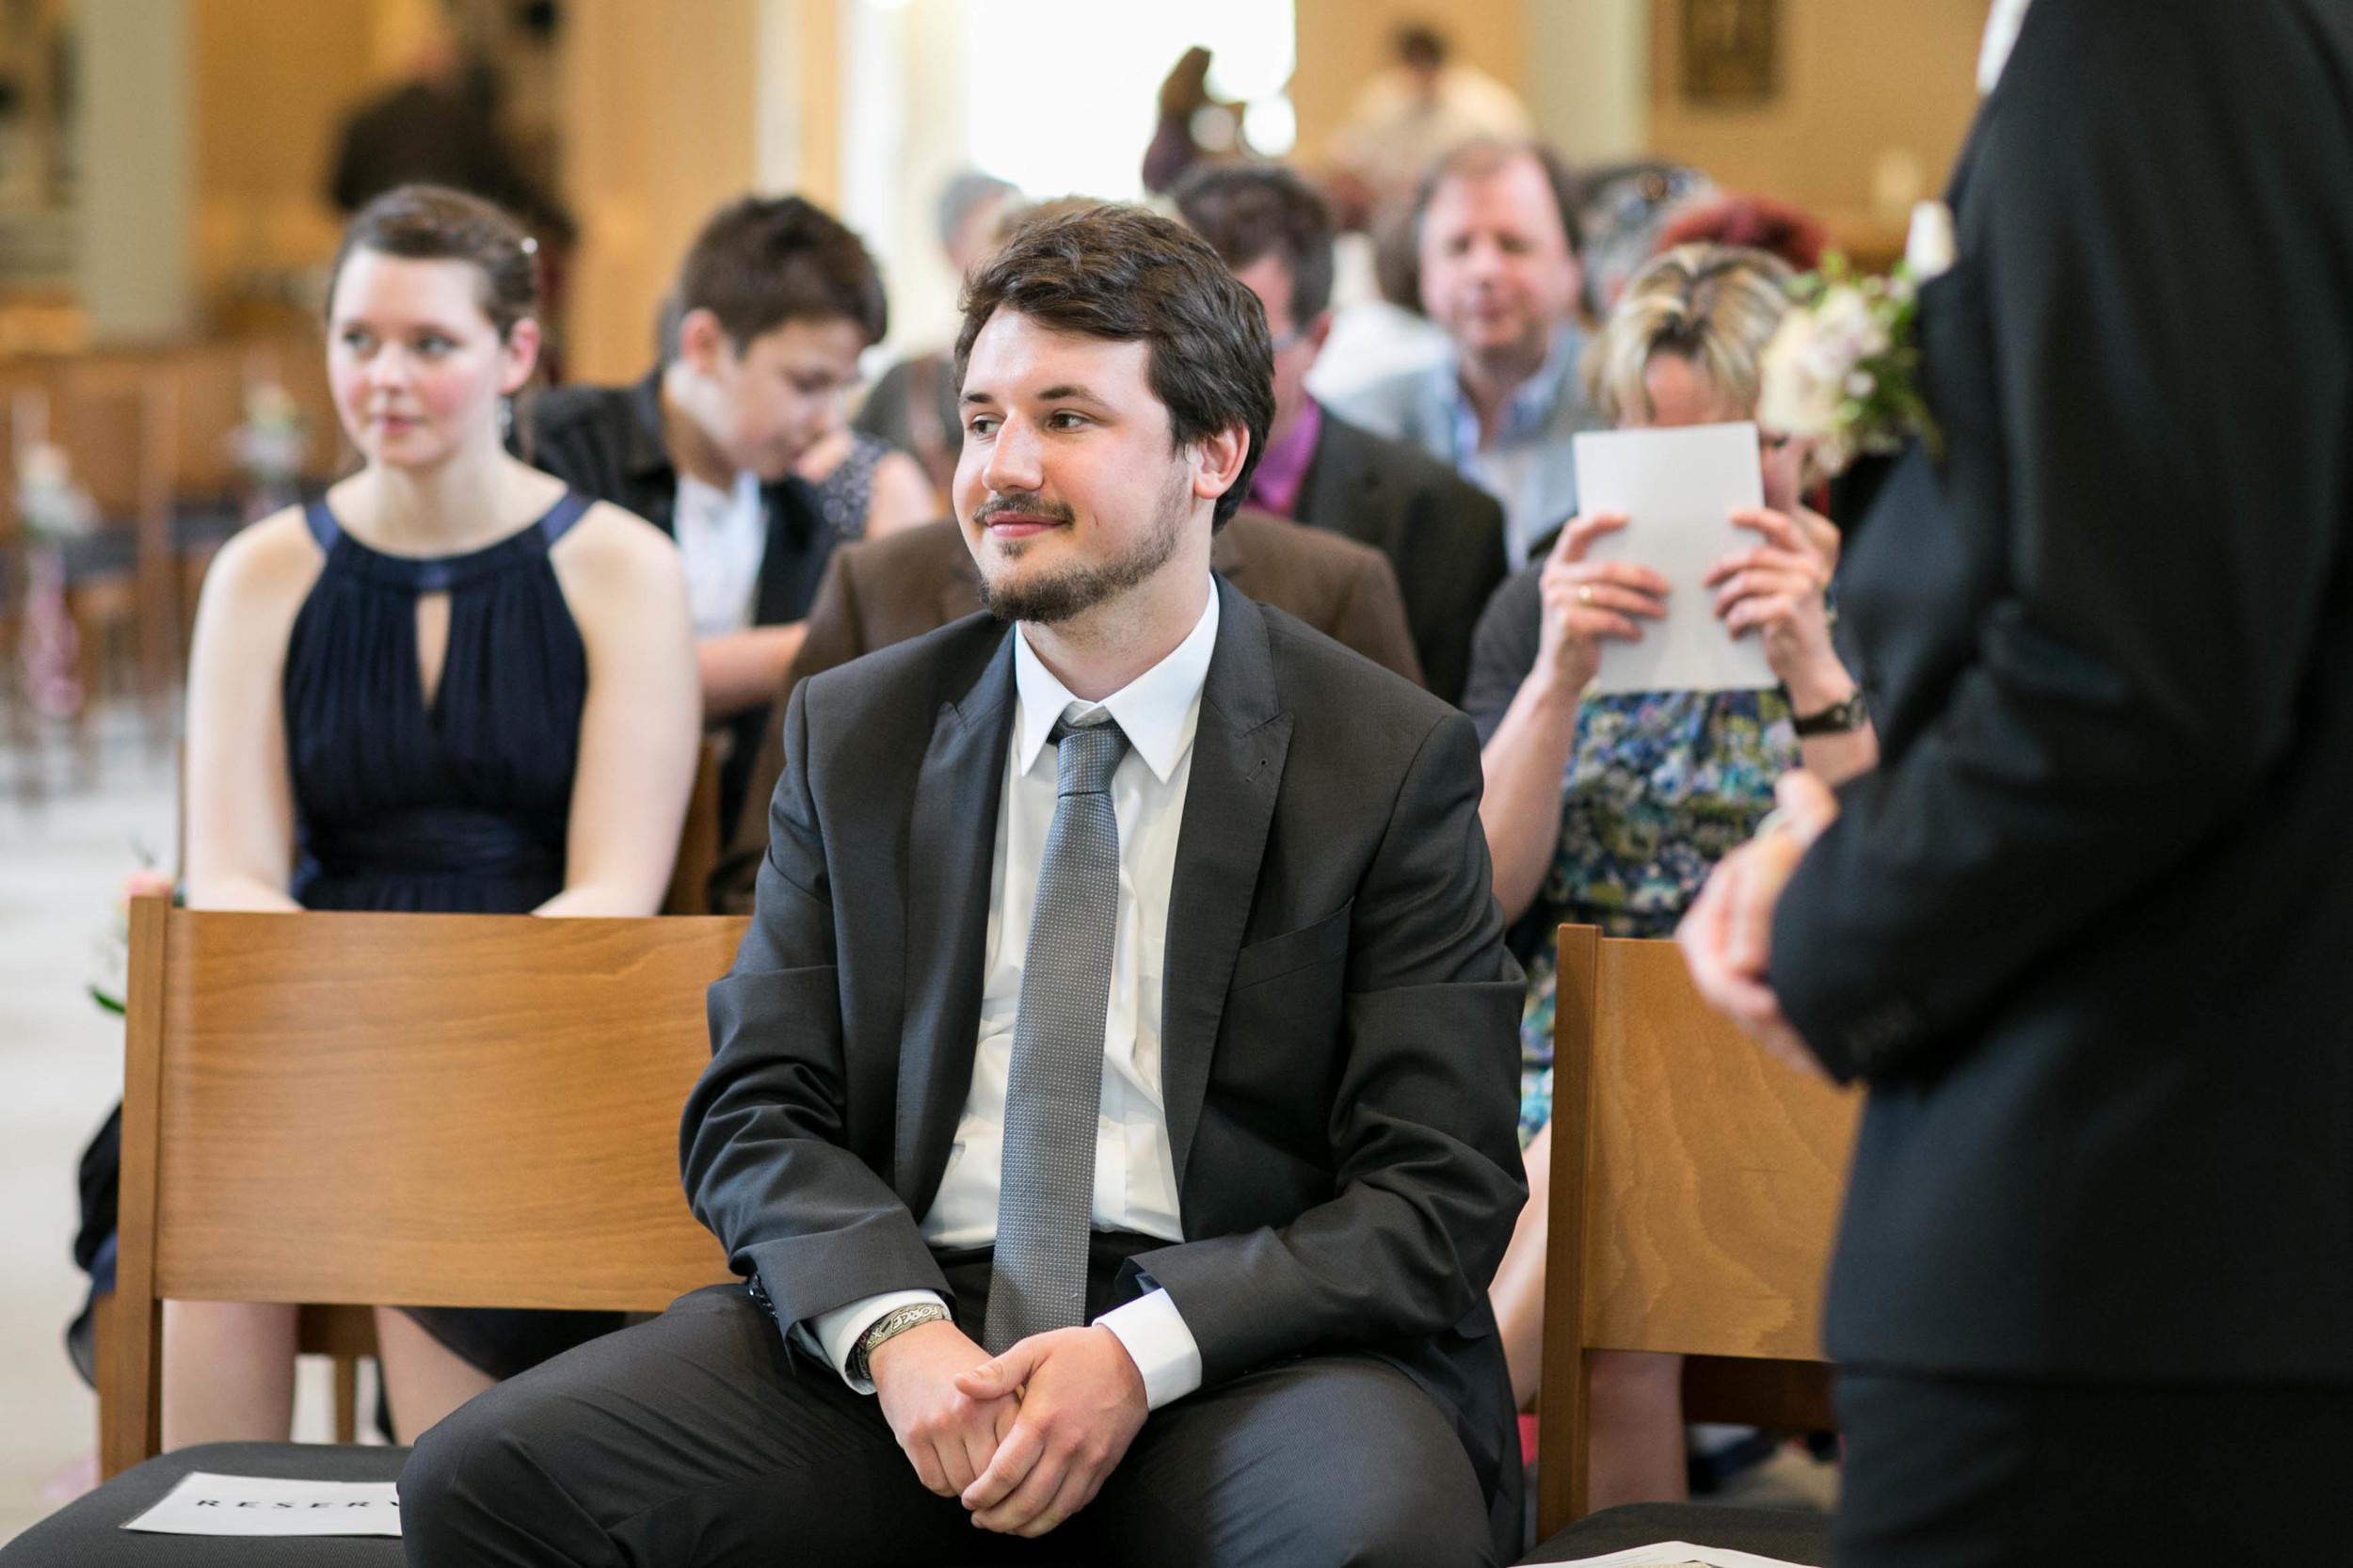 Berlin Hochzeitsfotografie_Fran Burrows-103.jpg